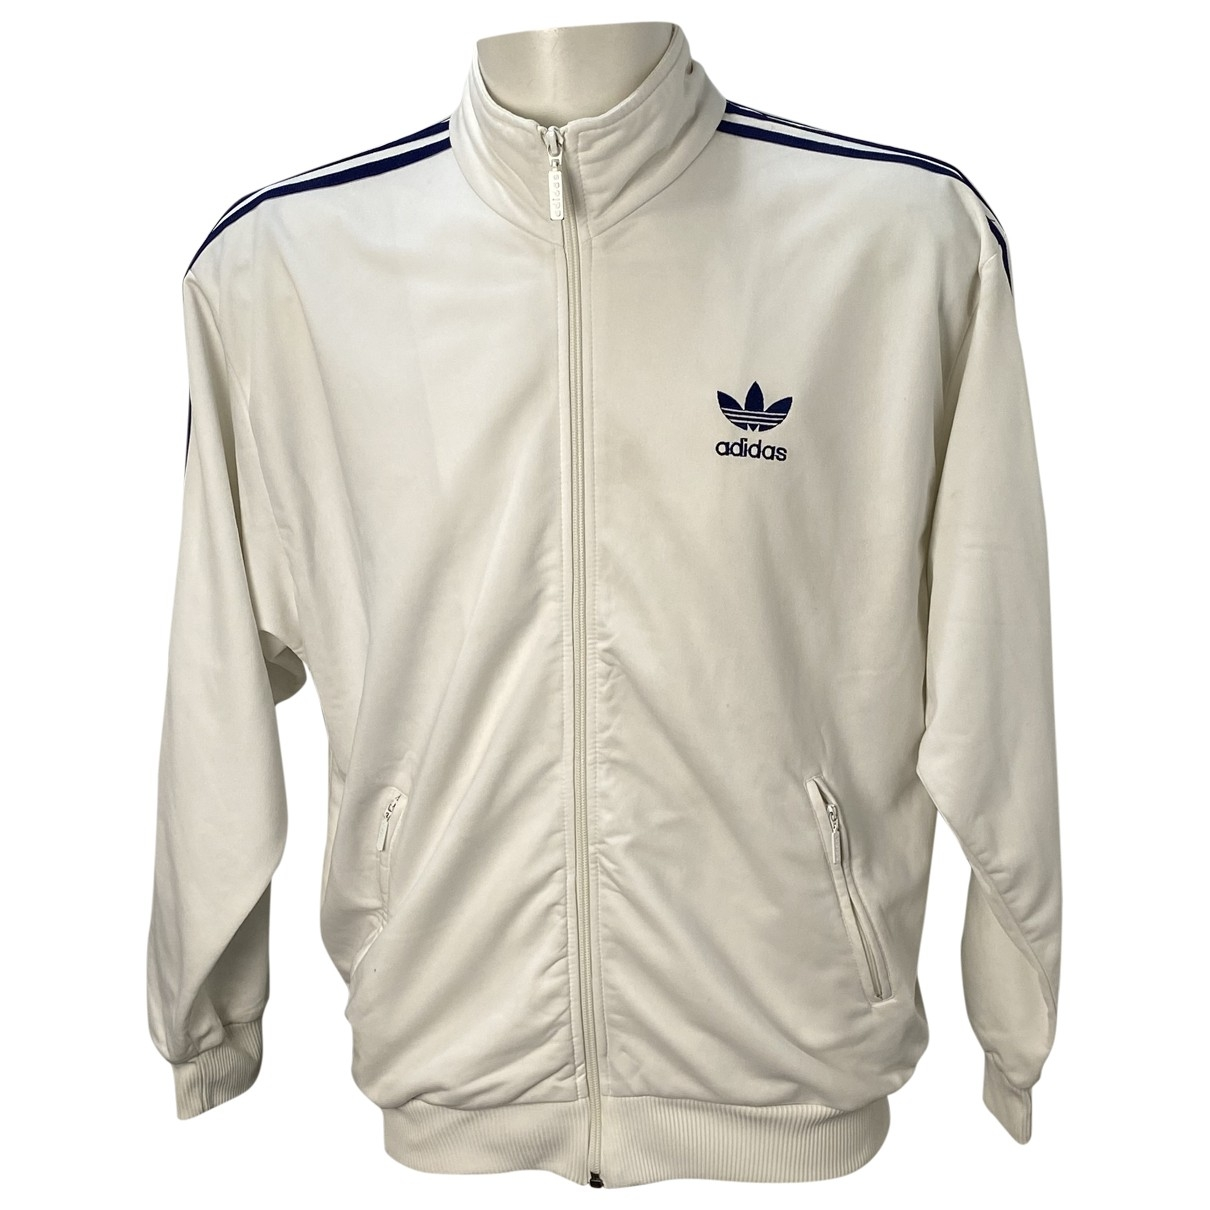 Adidas \N White Knitwear & Sweatshirts for Men M International